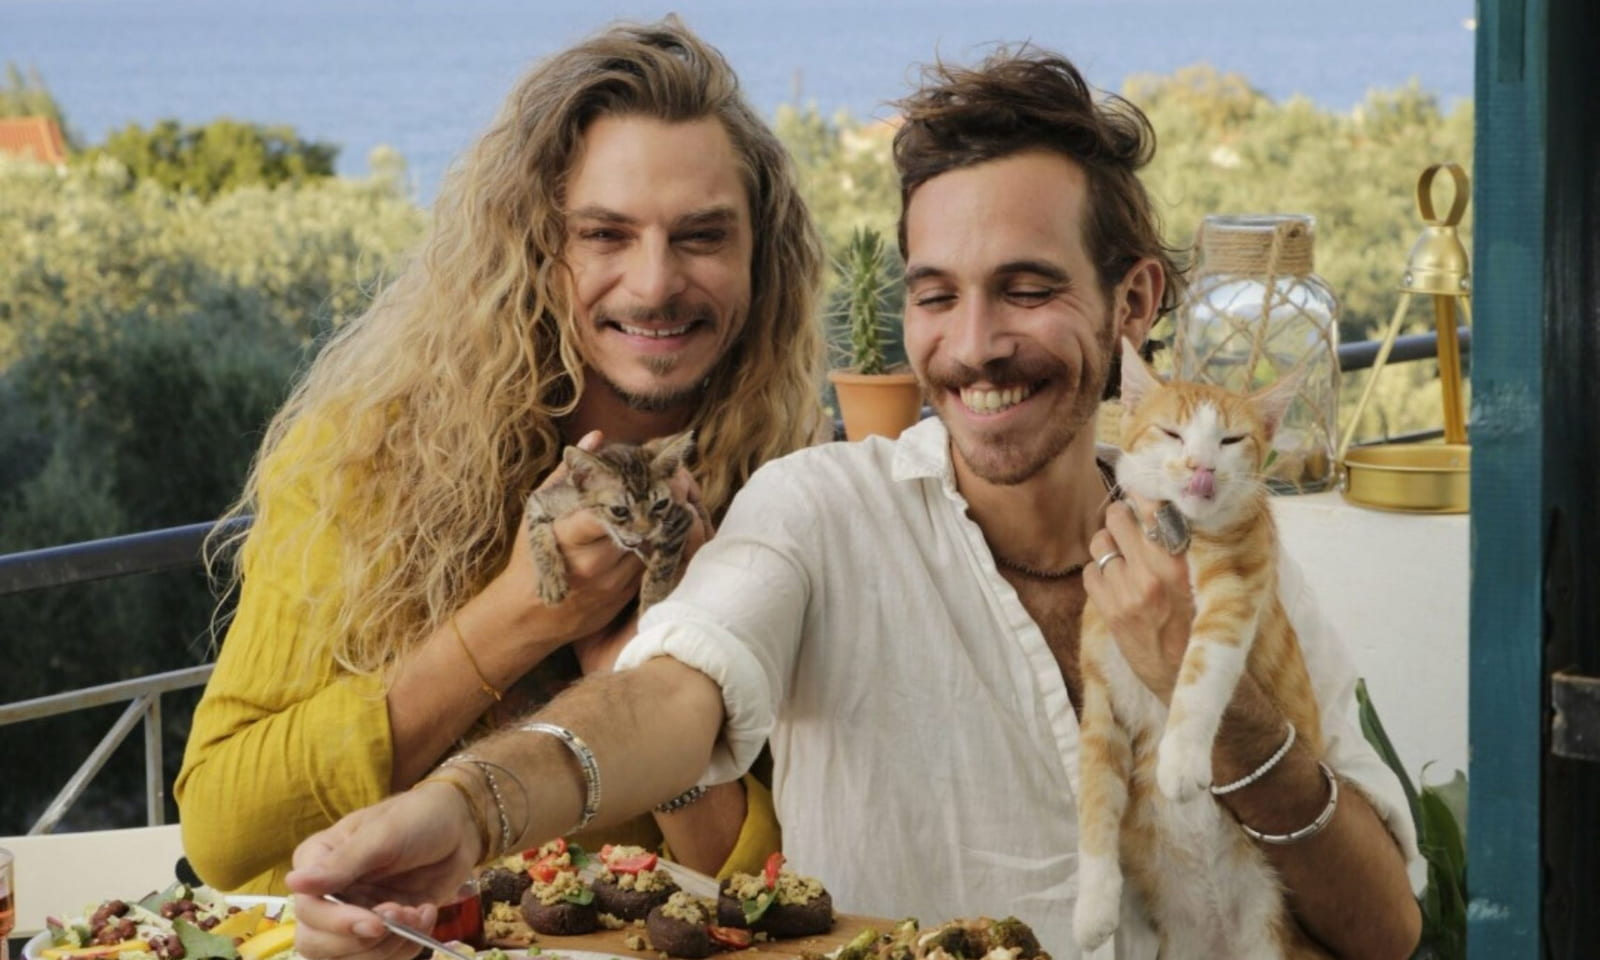 The Ultimate Couple Goal: Kristóf and Nimi's Paradisiac life in Greece